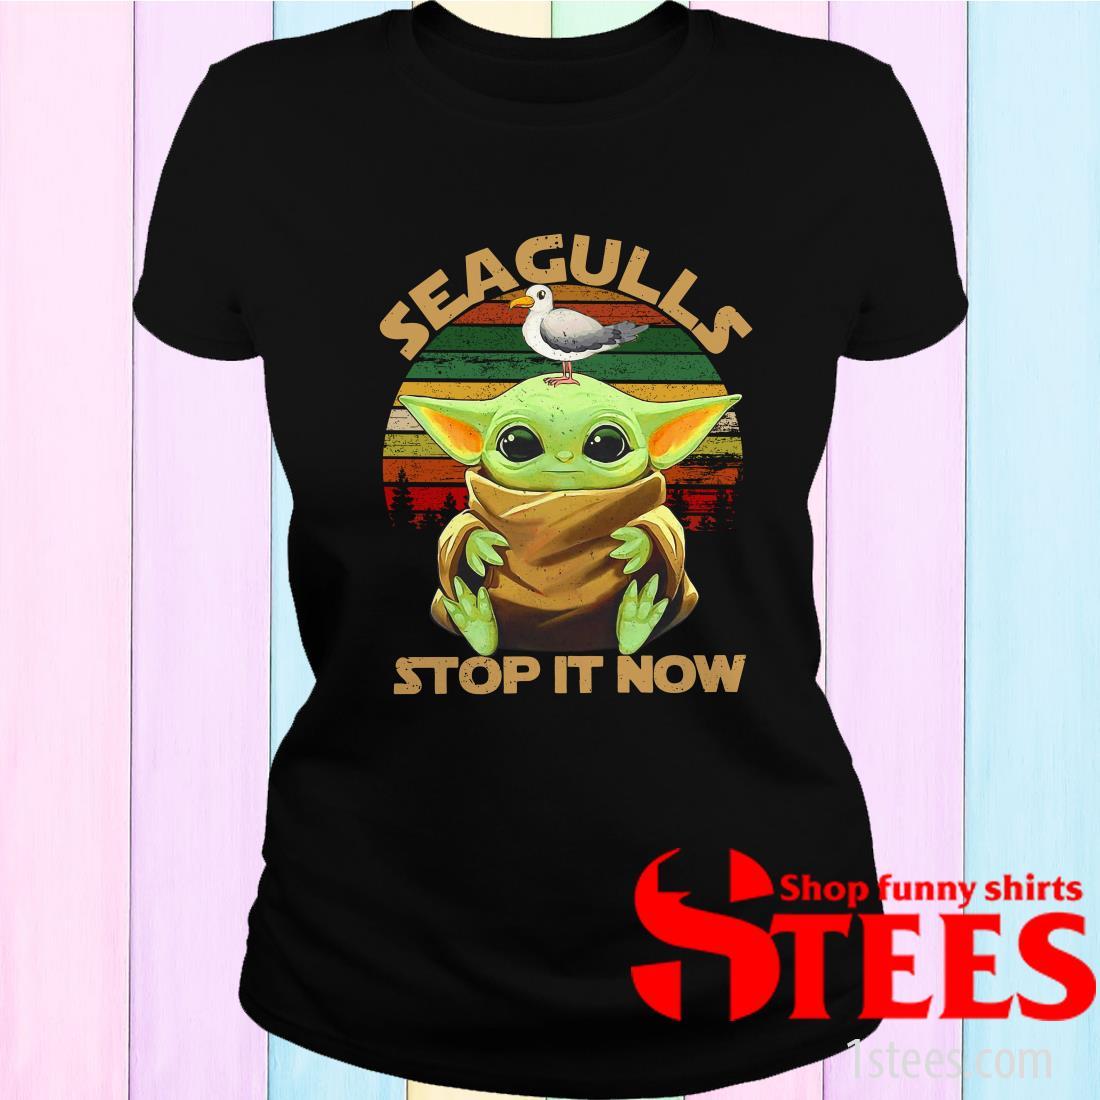 Star Wars Seagulls Baby Yoda Stop It Now Women's T-Shirt